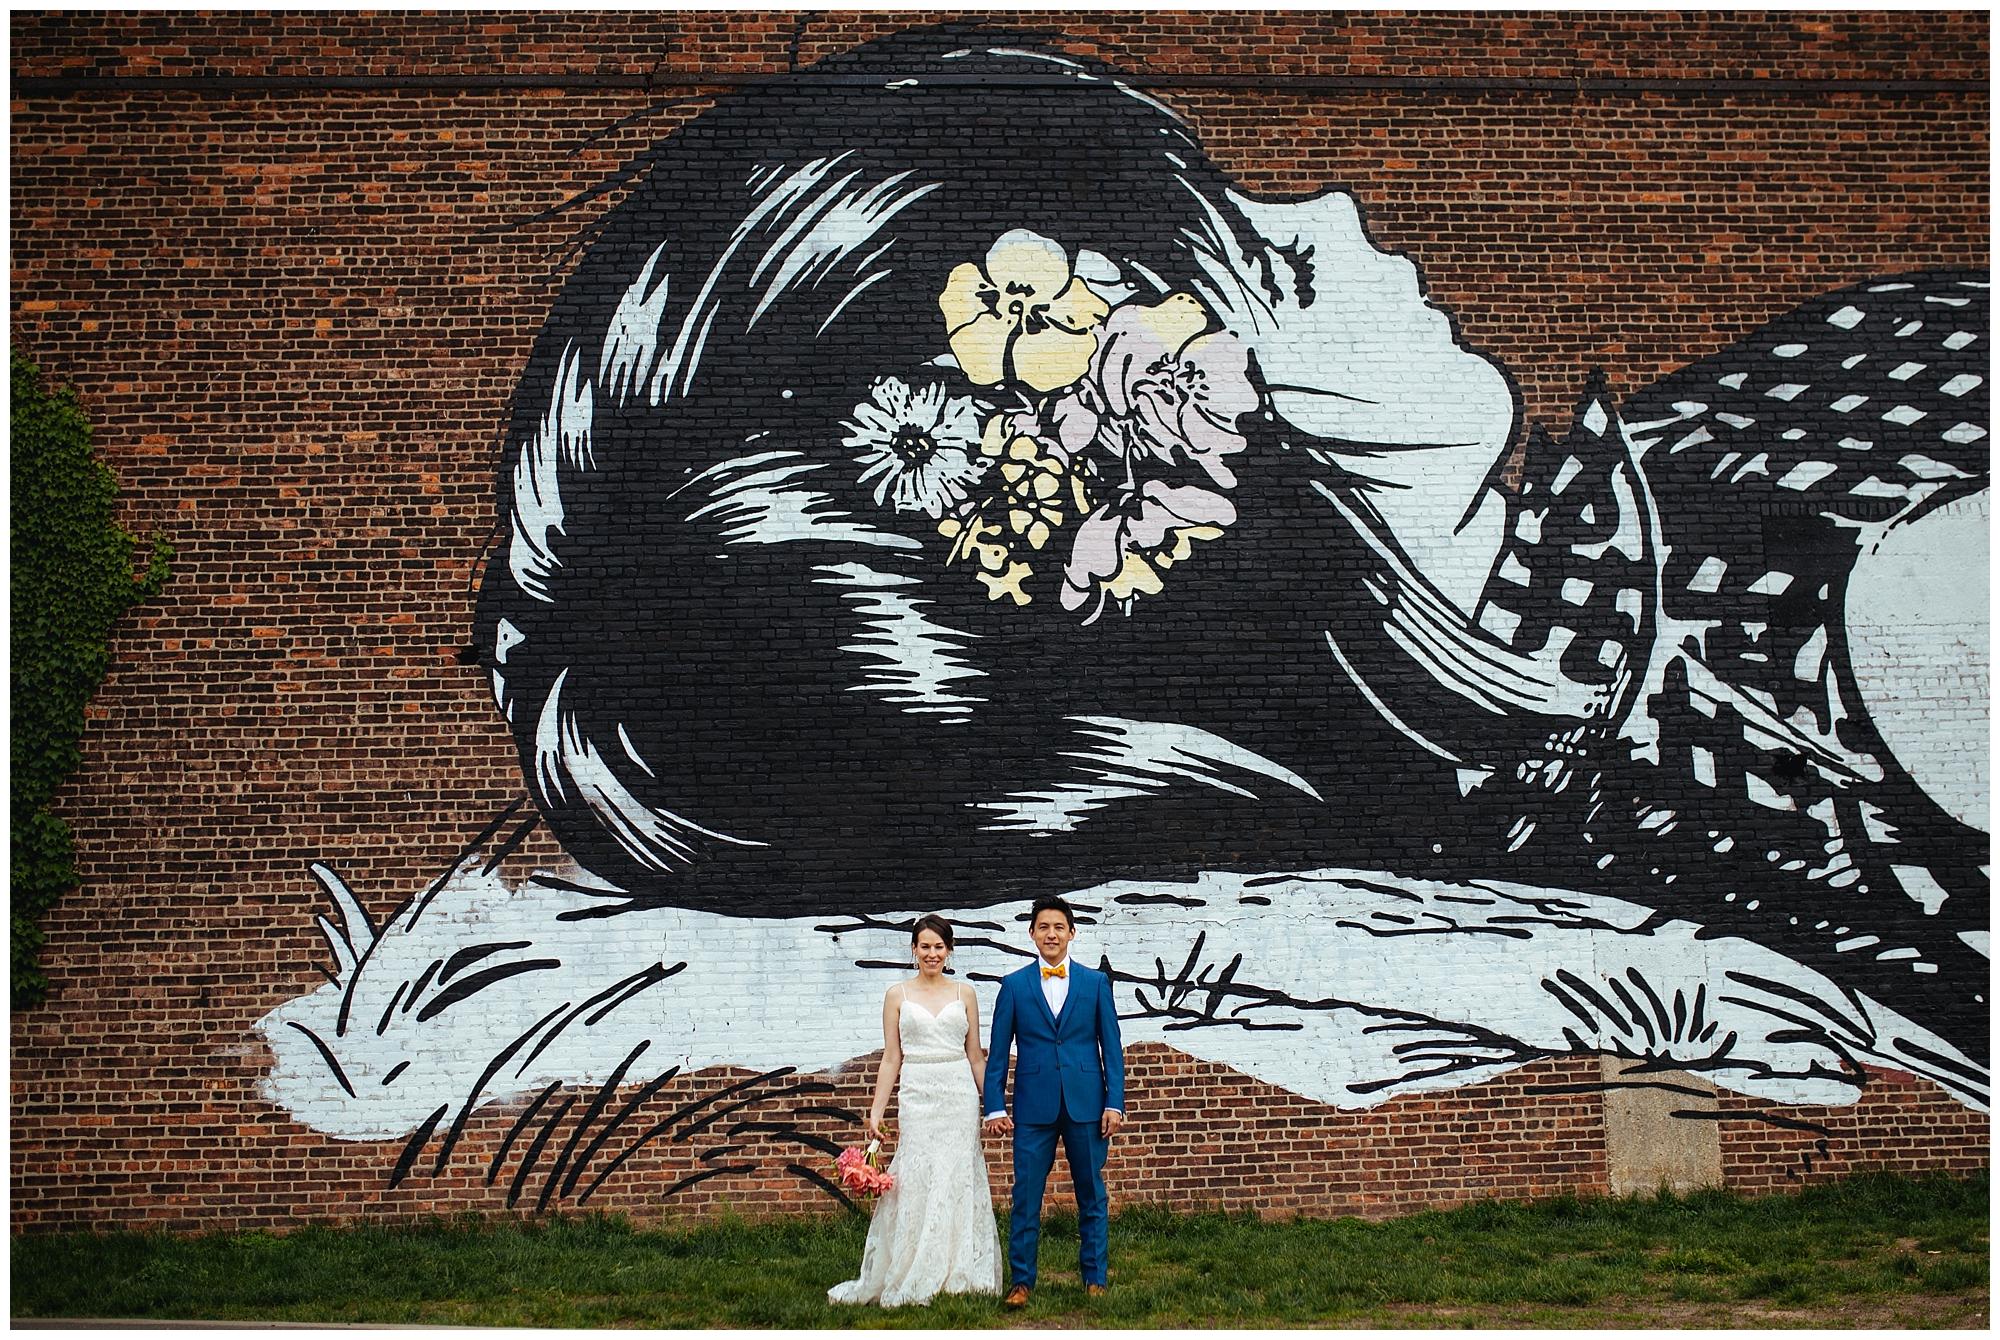 NYC-Wedding-Photographer12.jpg